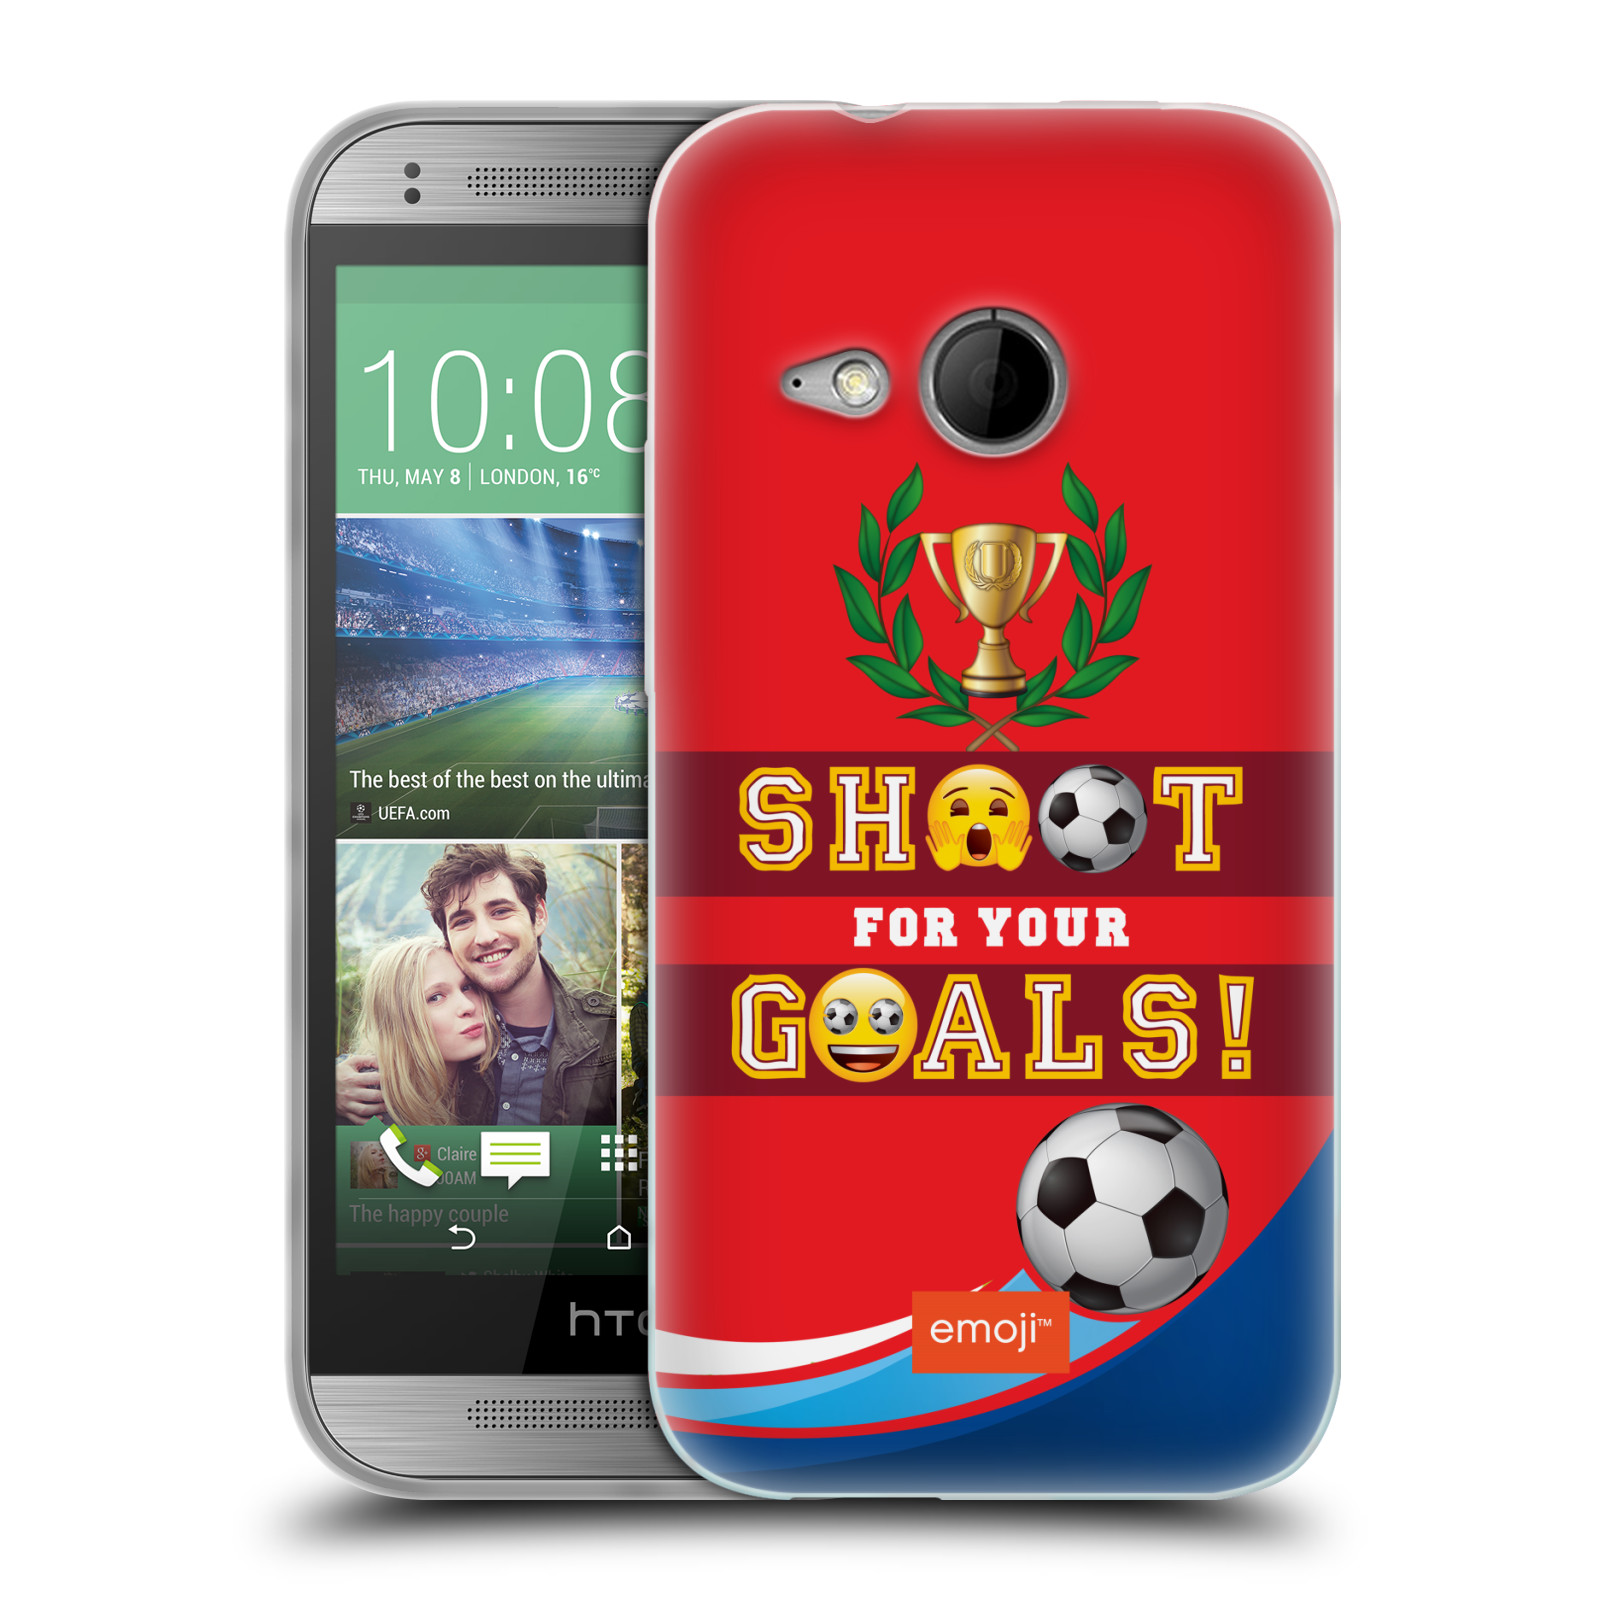 HEAD CASE silikonový obal na mobil HTC One MINI 2 smajlíci oficiální kryt EMOJI vzor fotbal střela a gól